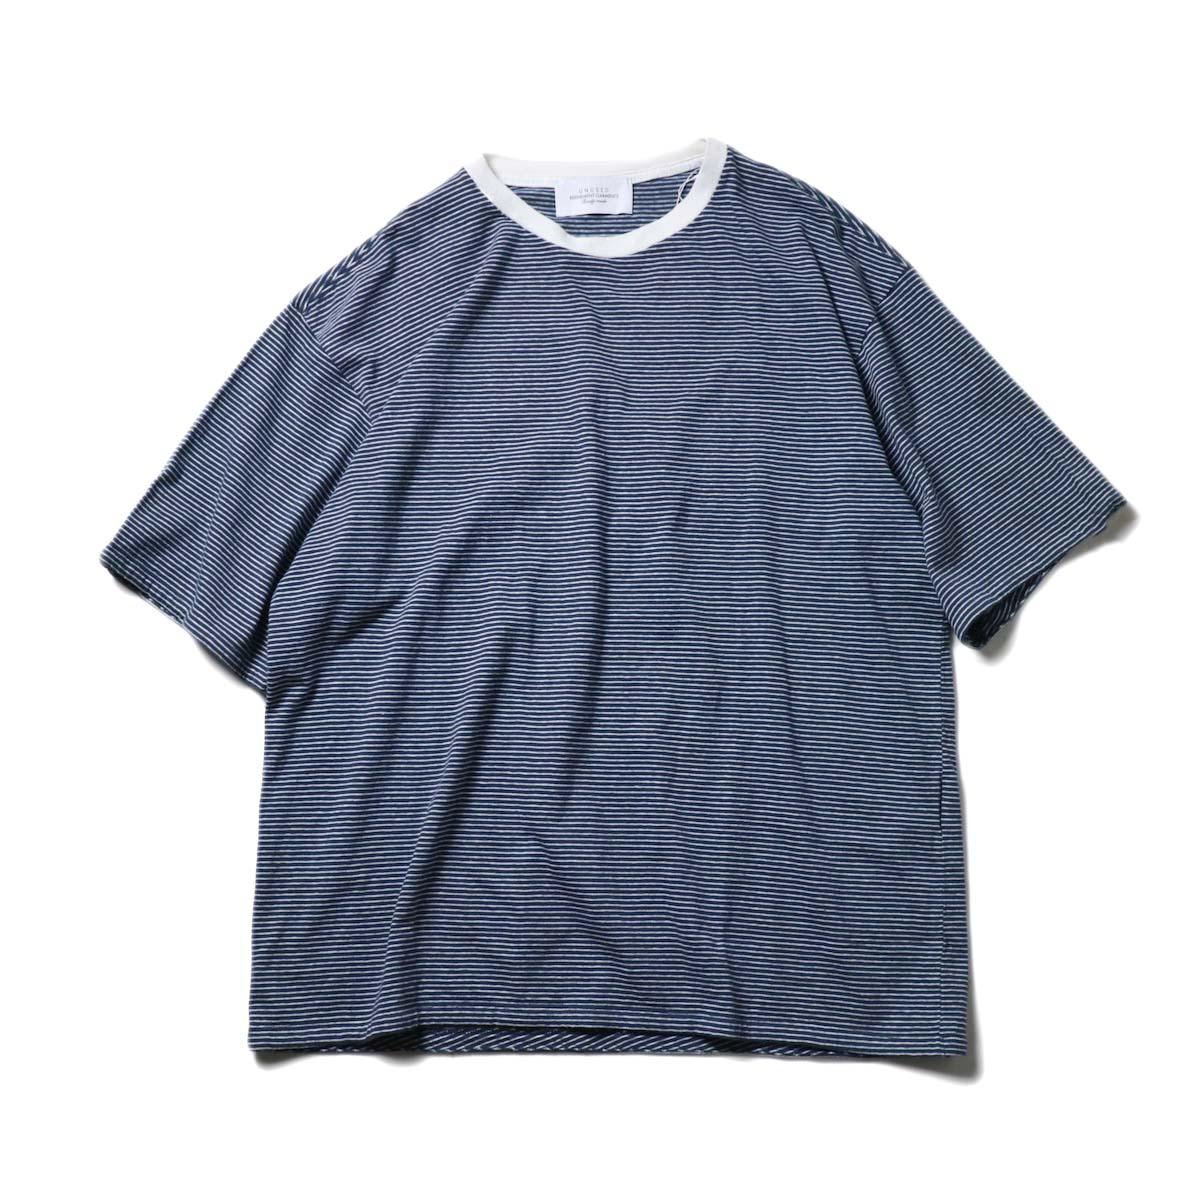 UNUSED / US1963 Short sleeve border t-shirt. (Navy × White)